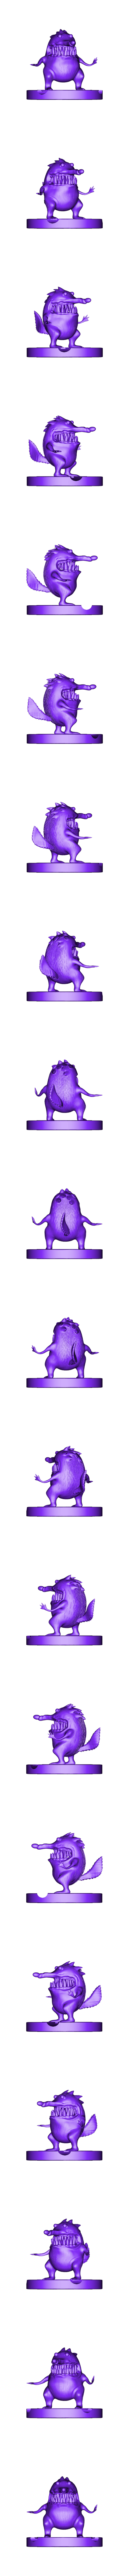 badger_woodpeaker.stl Download free STL file Badger Woodpeaker • Template to 3D print, mefedef